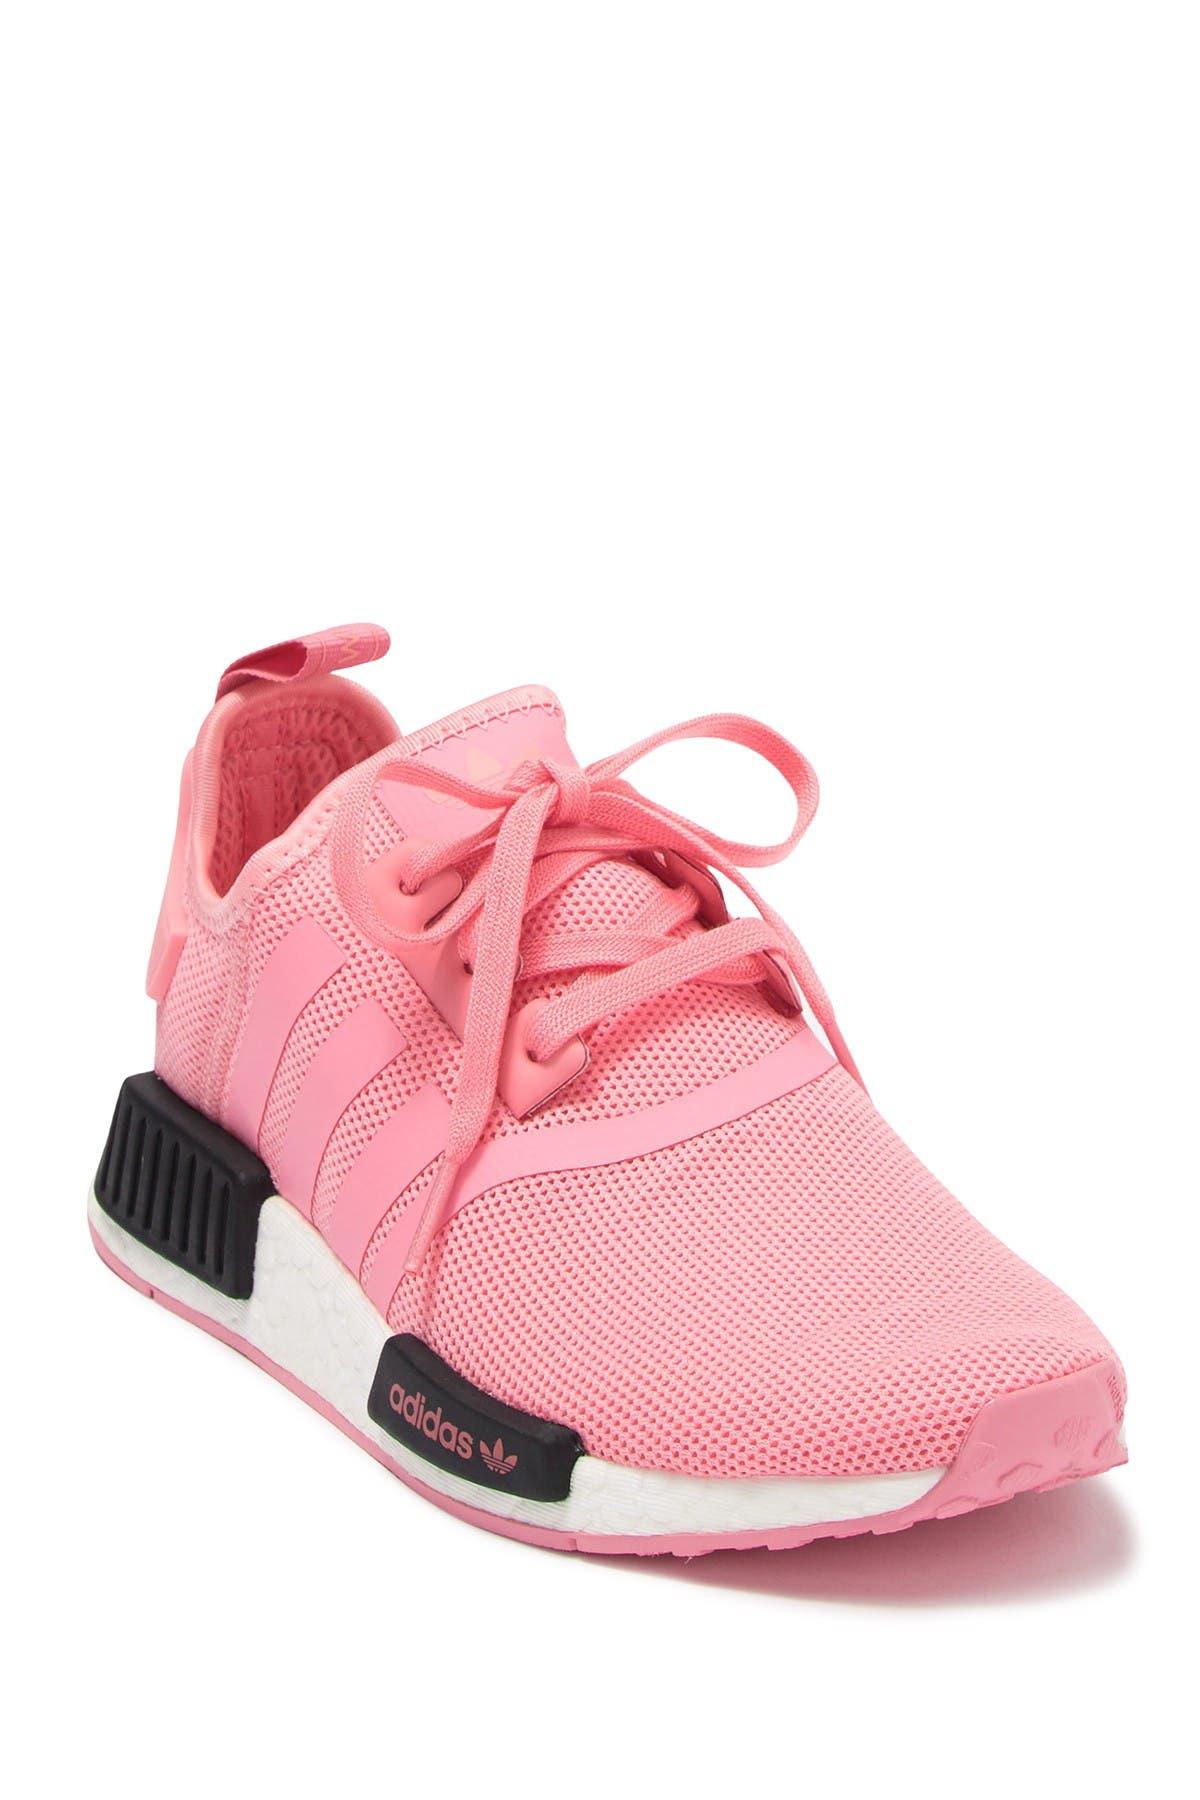 Image of ADIDAS ORIGINALS NMD R1 Sneaker